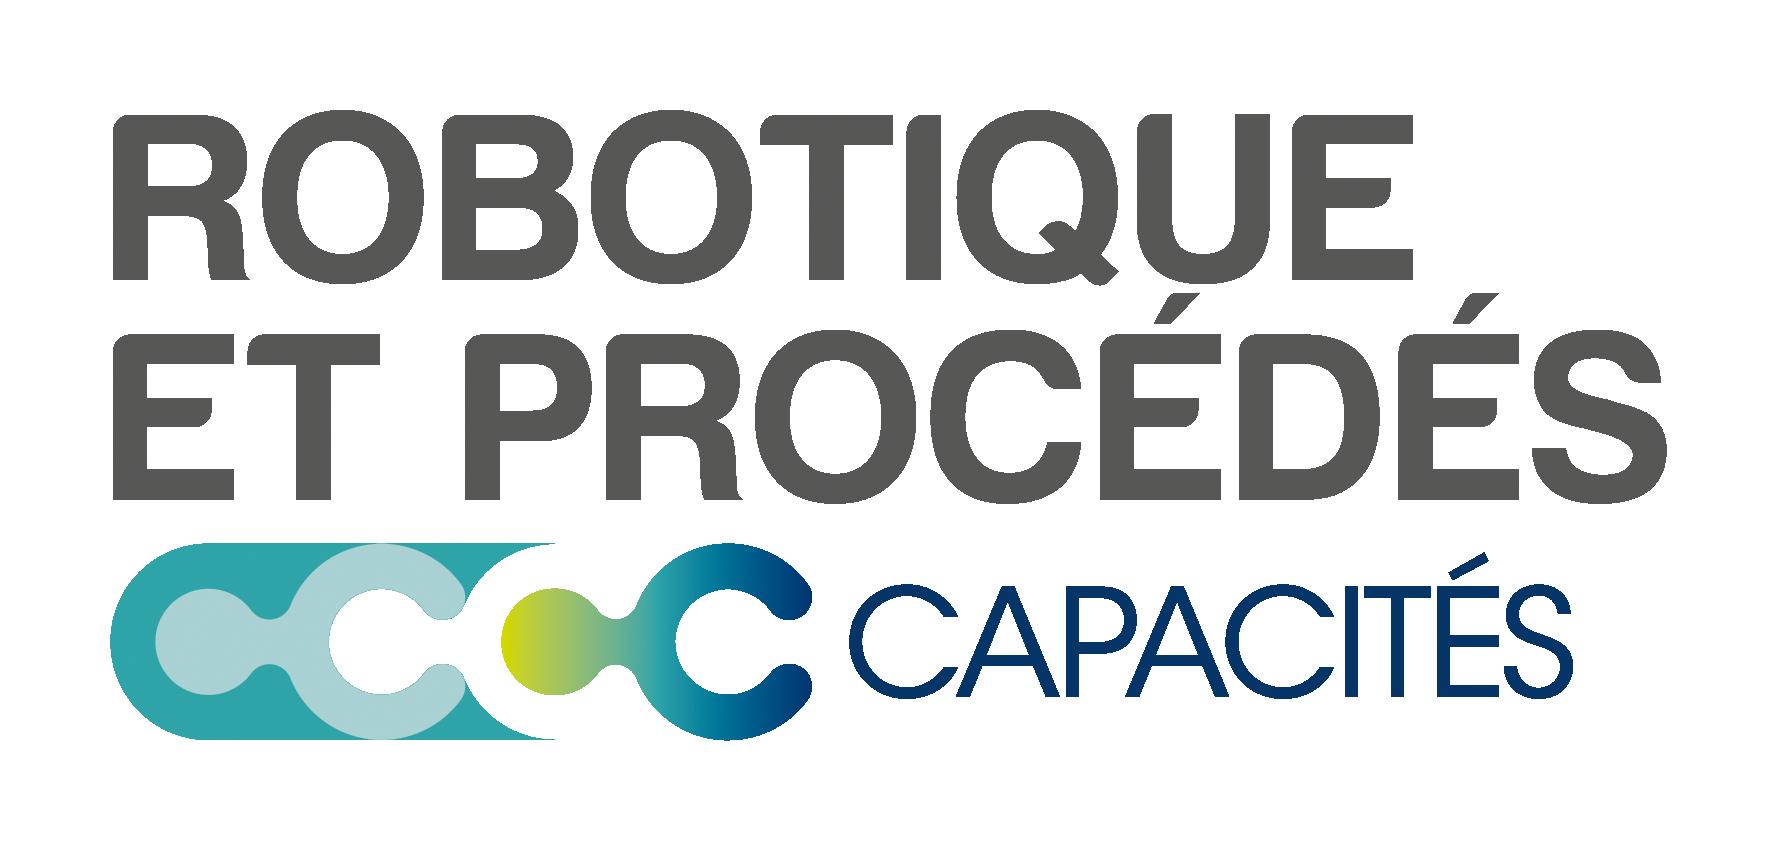 Capacite-Cellule_RobotiqueEtProcedes